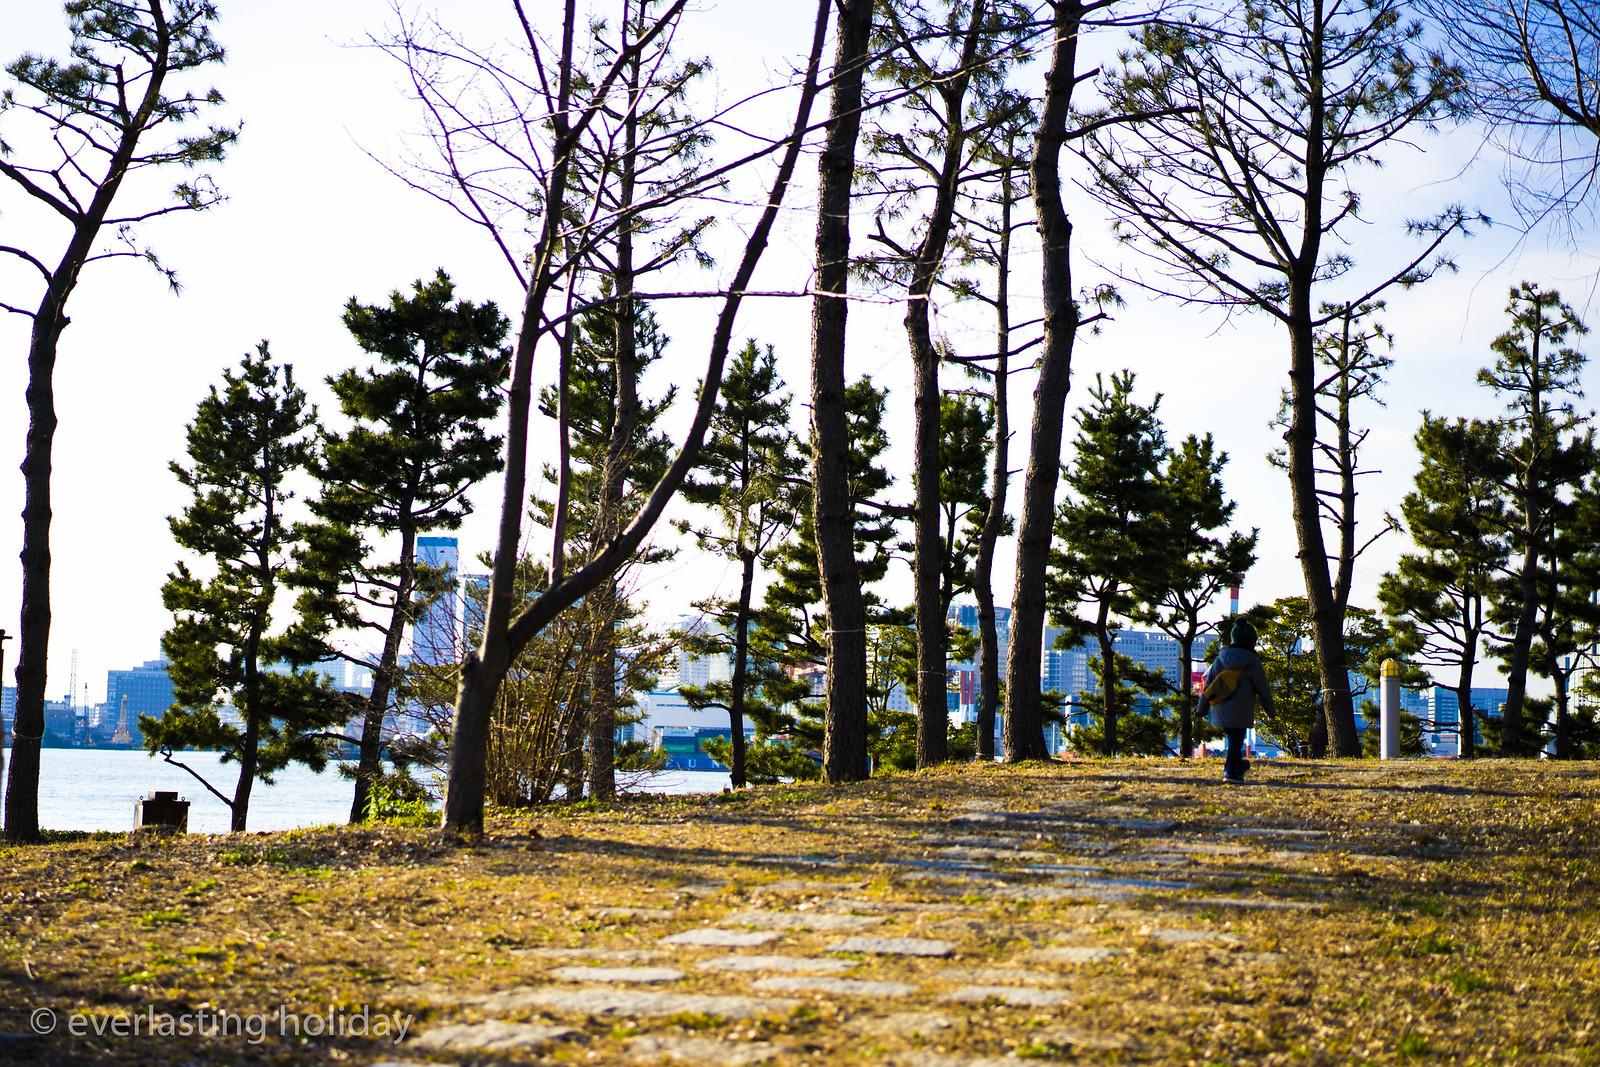 潮風公園 Shiokaze Park-0001